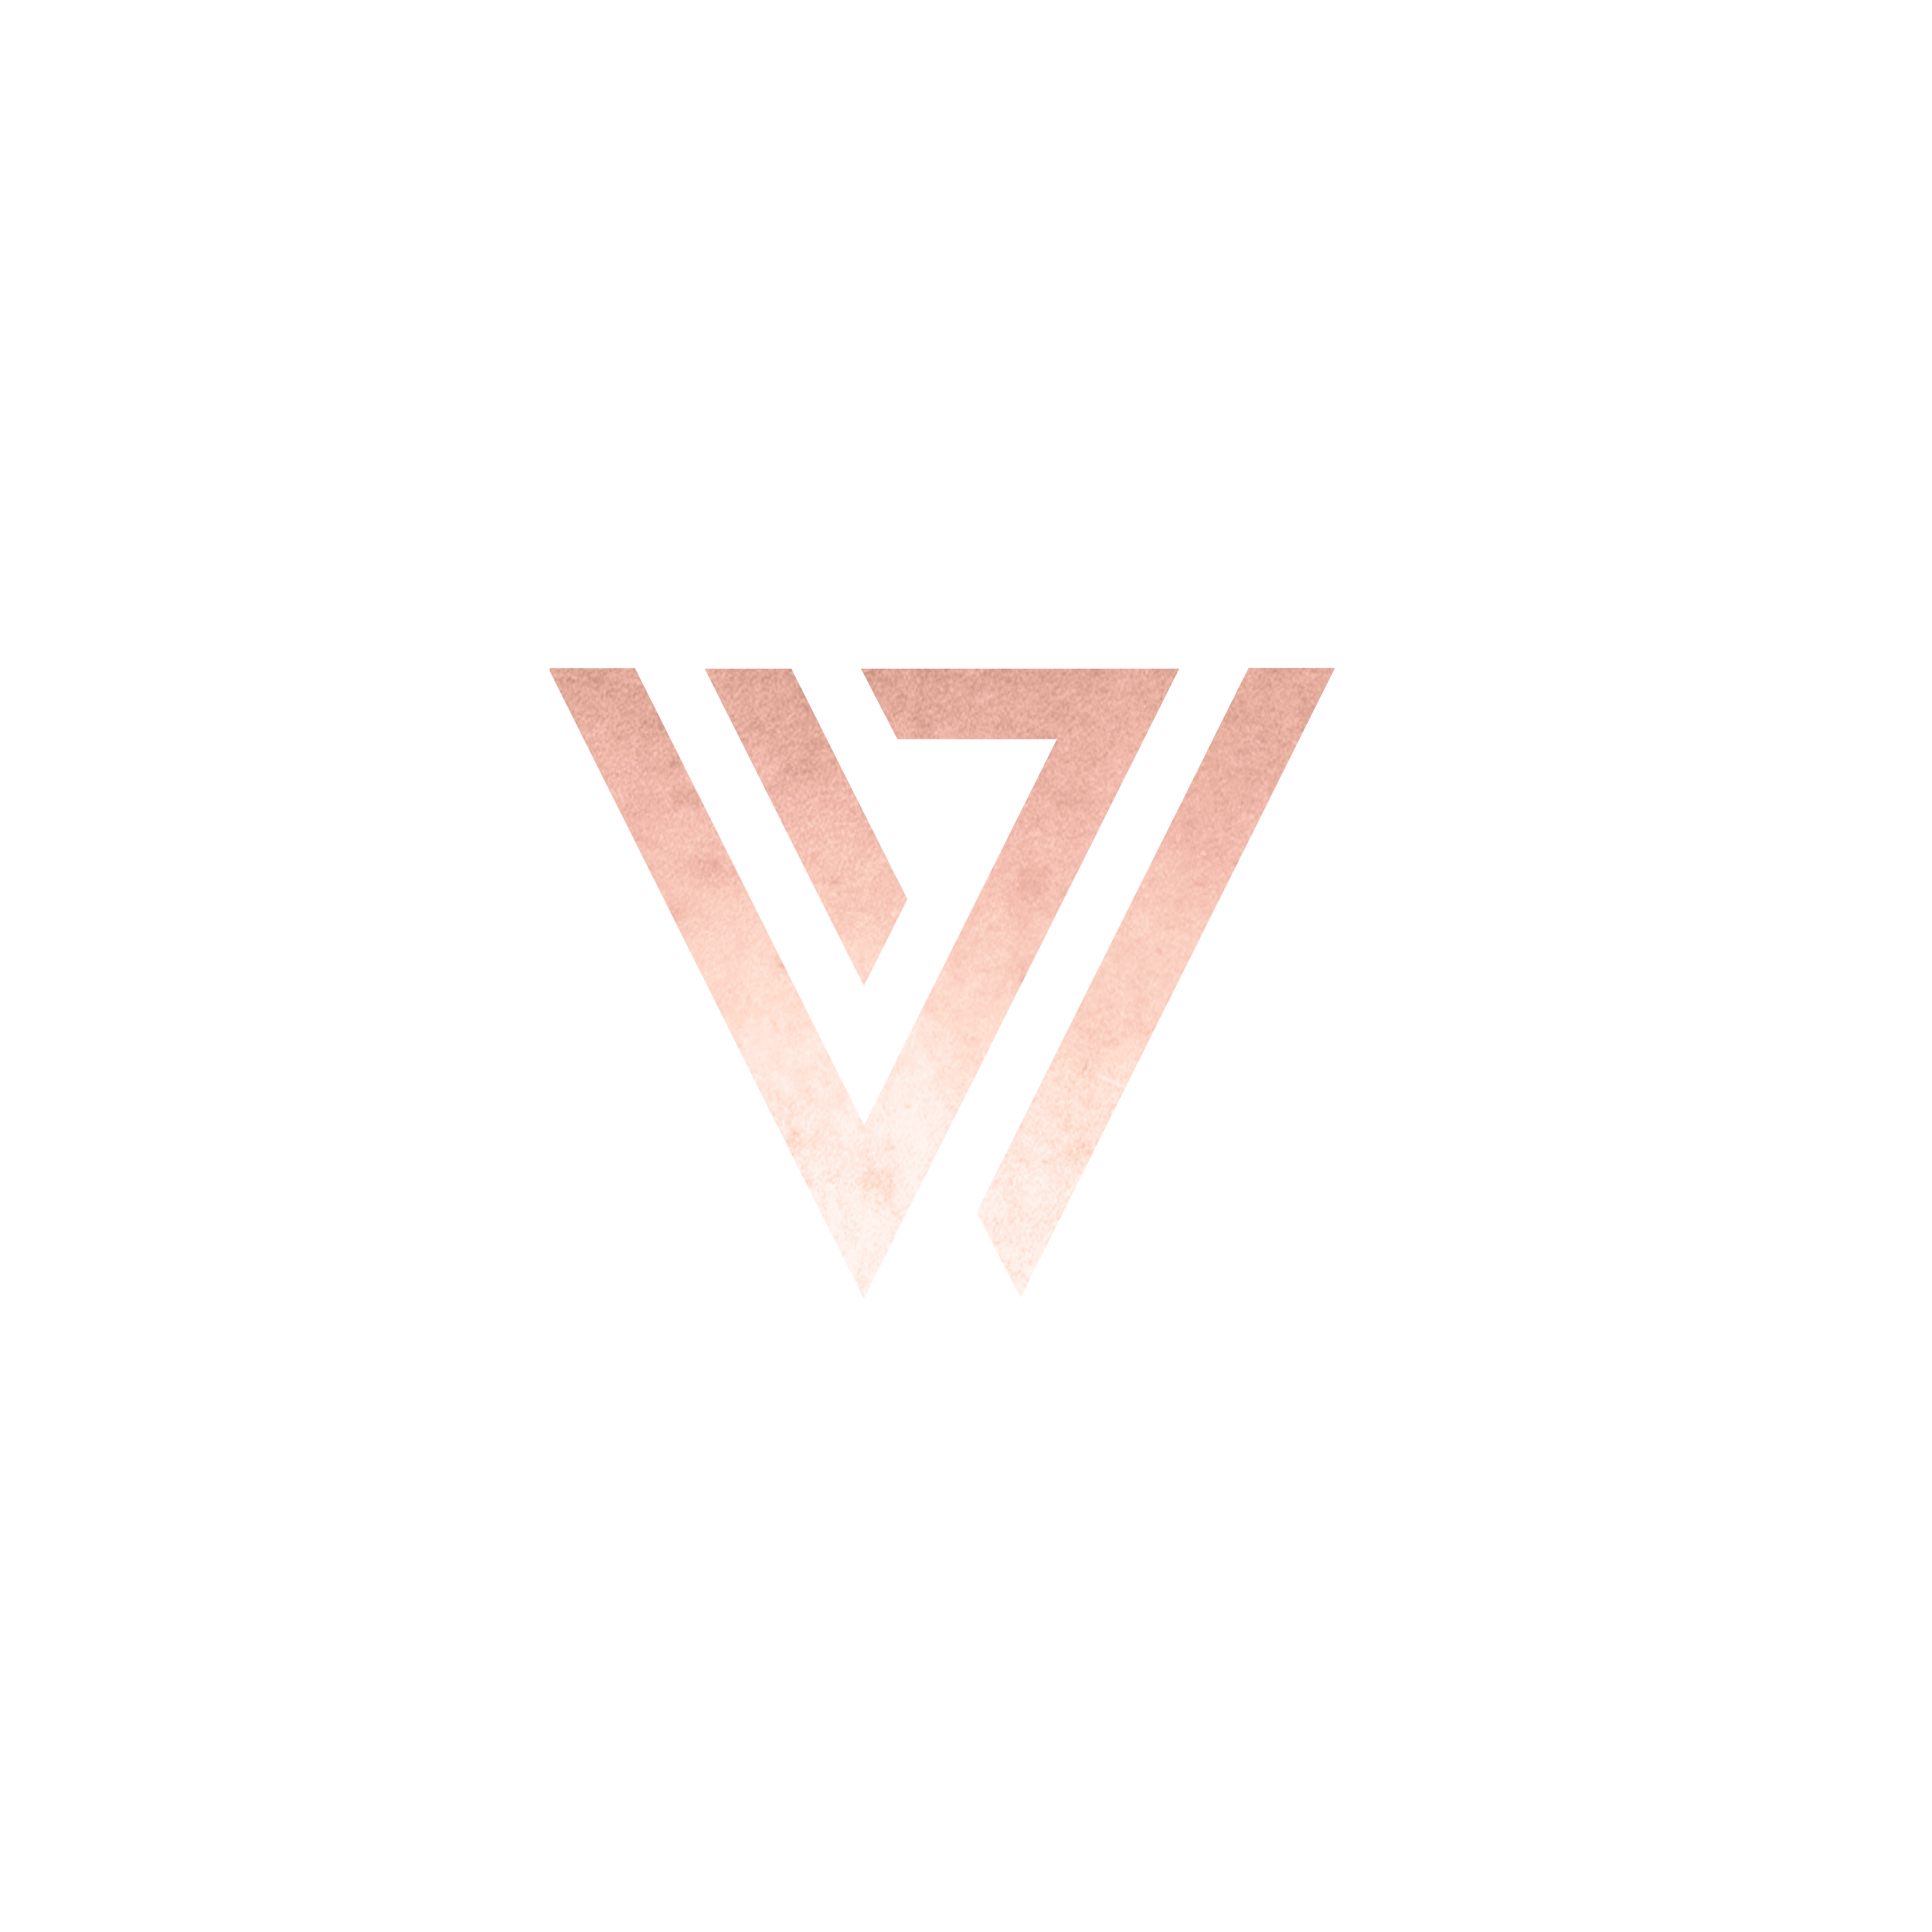 Vv Logo Designed By Amari Creative Amaricreative Logo Branding Design Brand Business Creative Branding Design Branding Design Studio Creative Branding